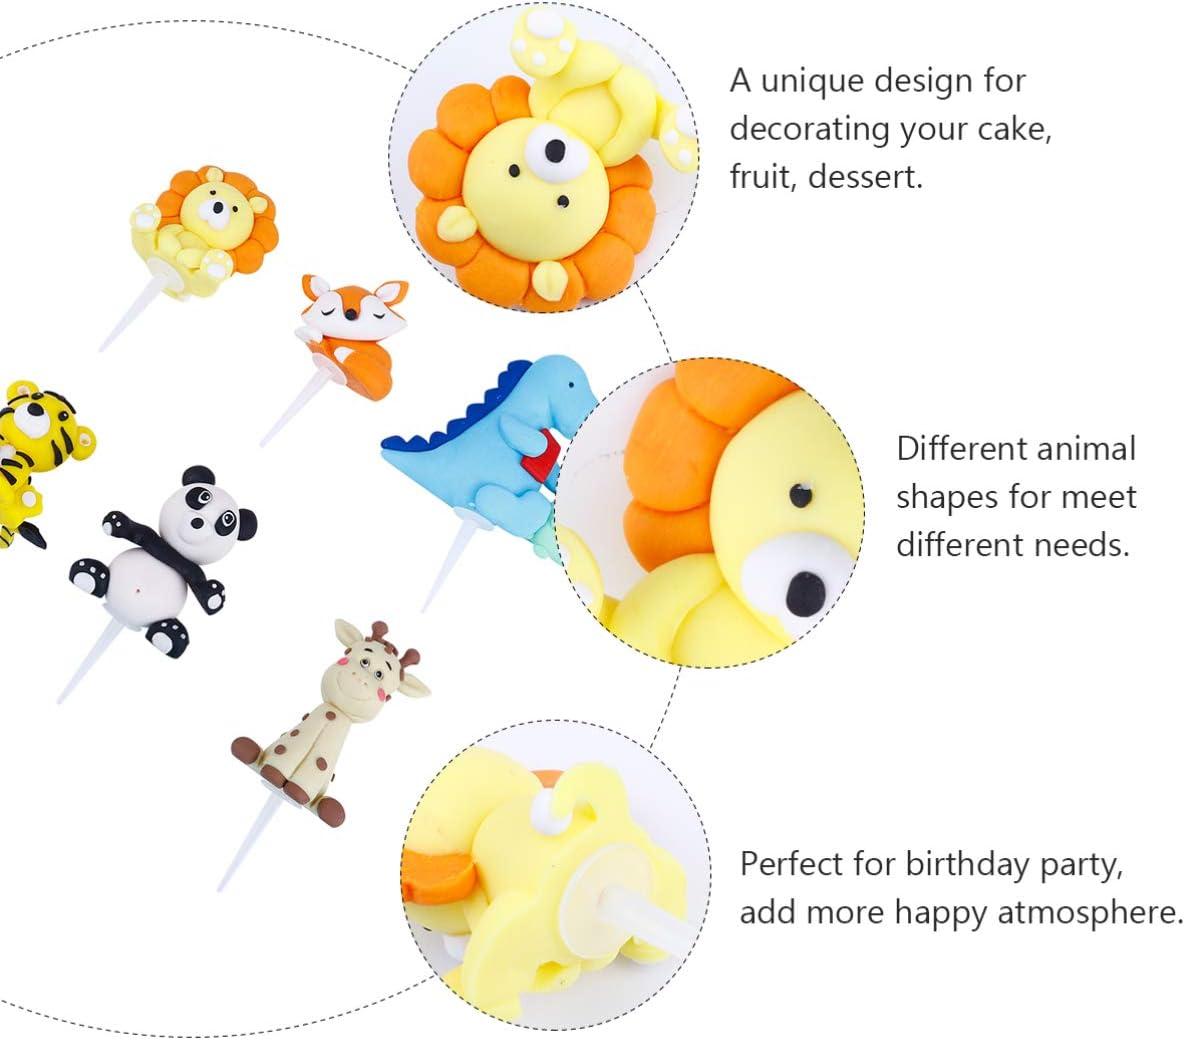 baby shower ni/ño decoracion cumplea/ños adornos dinosaurios tarta infantil topper 6 Piezas Selva Safari Animal Cupcake Toppers Selecciones Zoo Animal Cake Toppers Selecciones para Ni/ños Fiesta